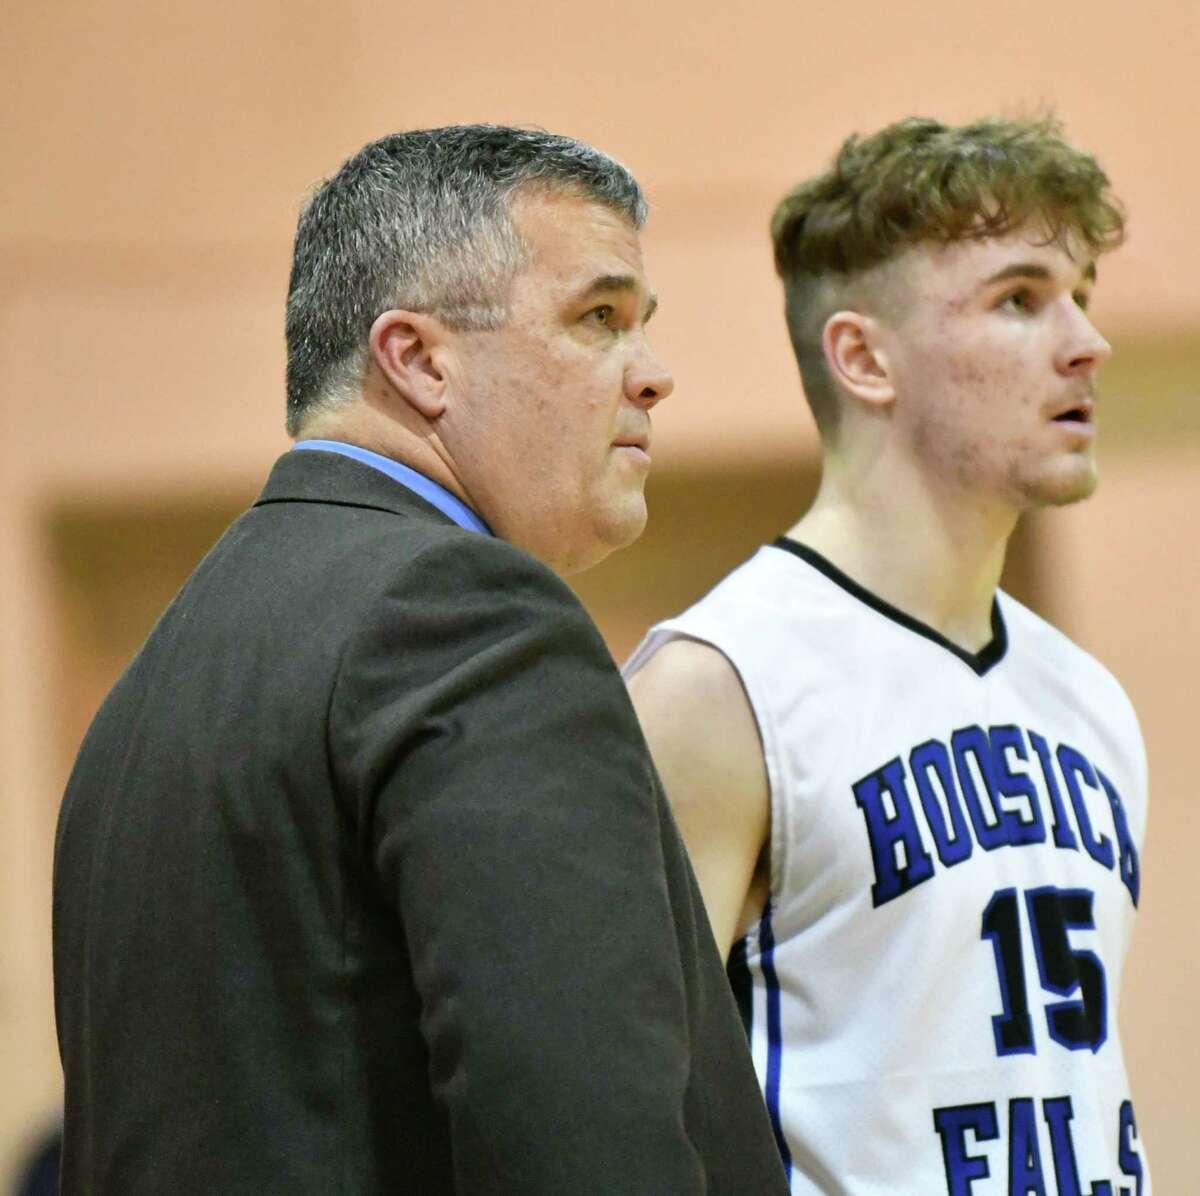 Hoosick Falls head coach Mike Lilac talks to Max Kipp during a basketball game against Tamarac on Wednesday, Dec. 19, 2018 in Hoosick Falls, N.Y. (Lori Van Buren/Times Union)